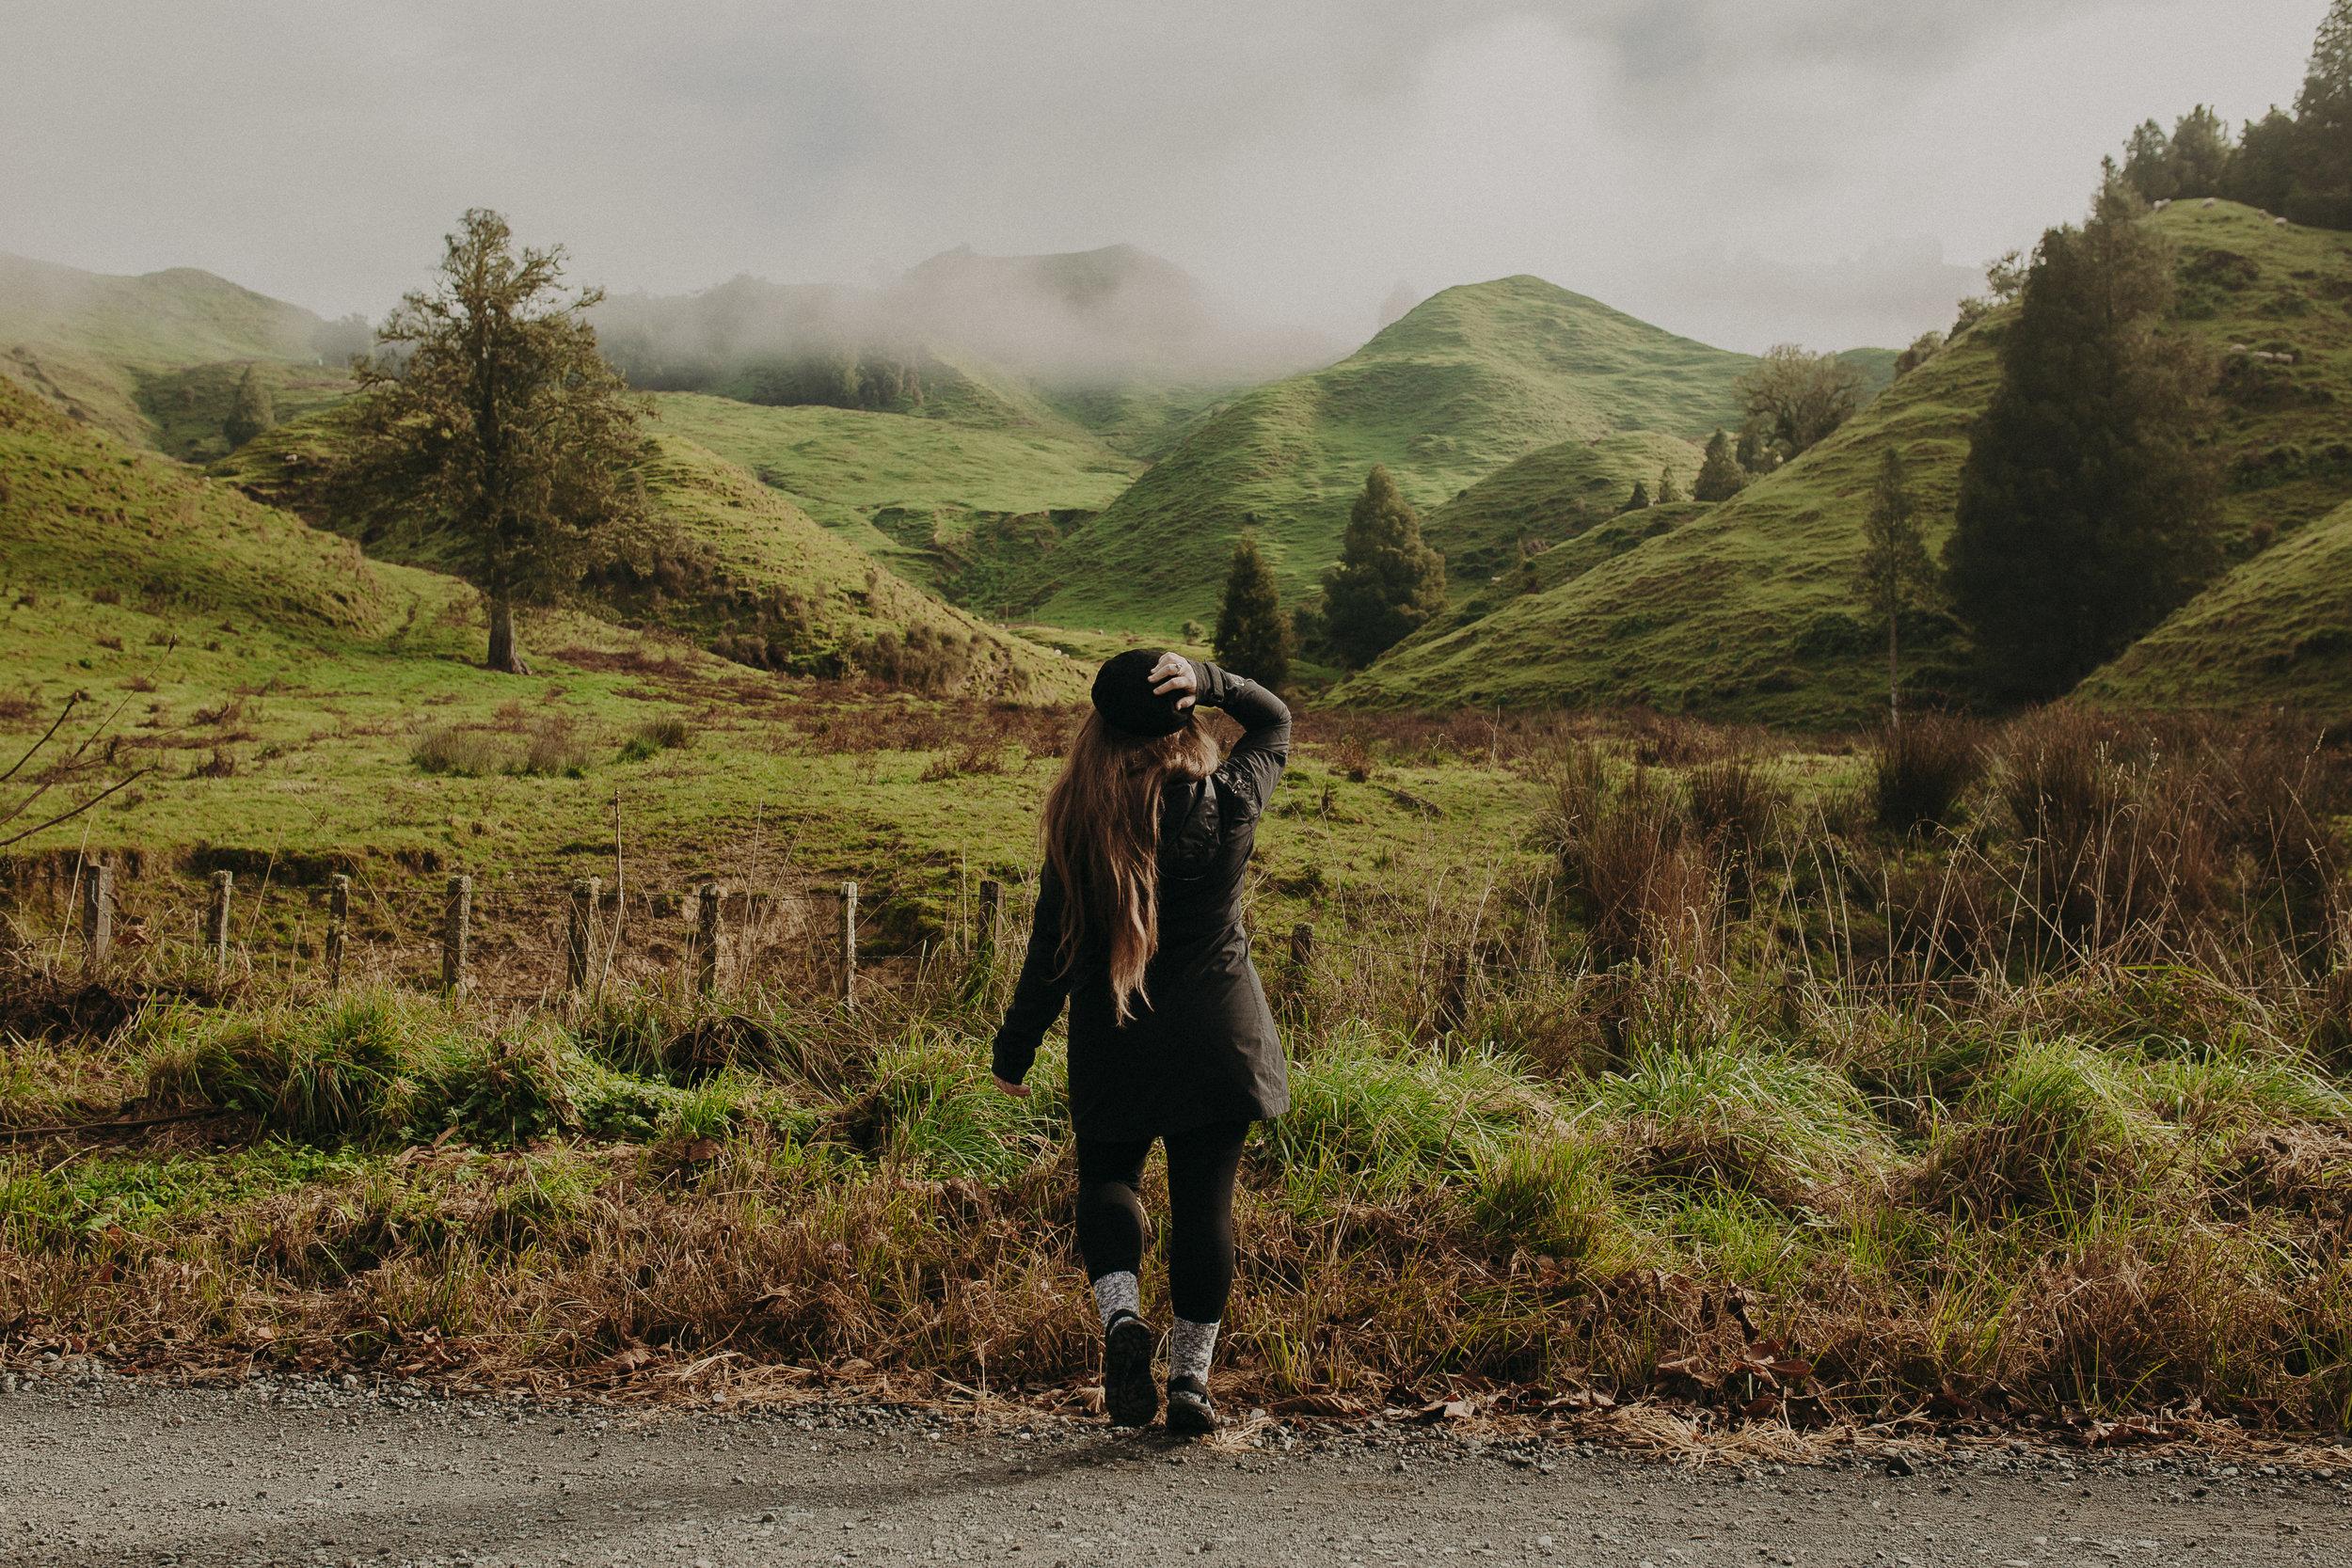 Forgotten-World-Highway-New-Zealand-8.jpg